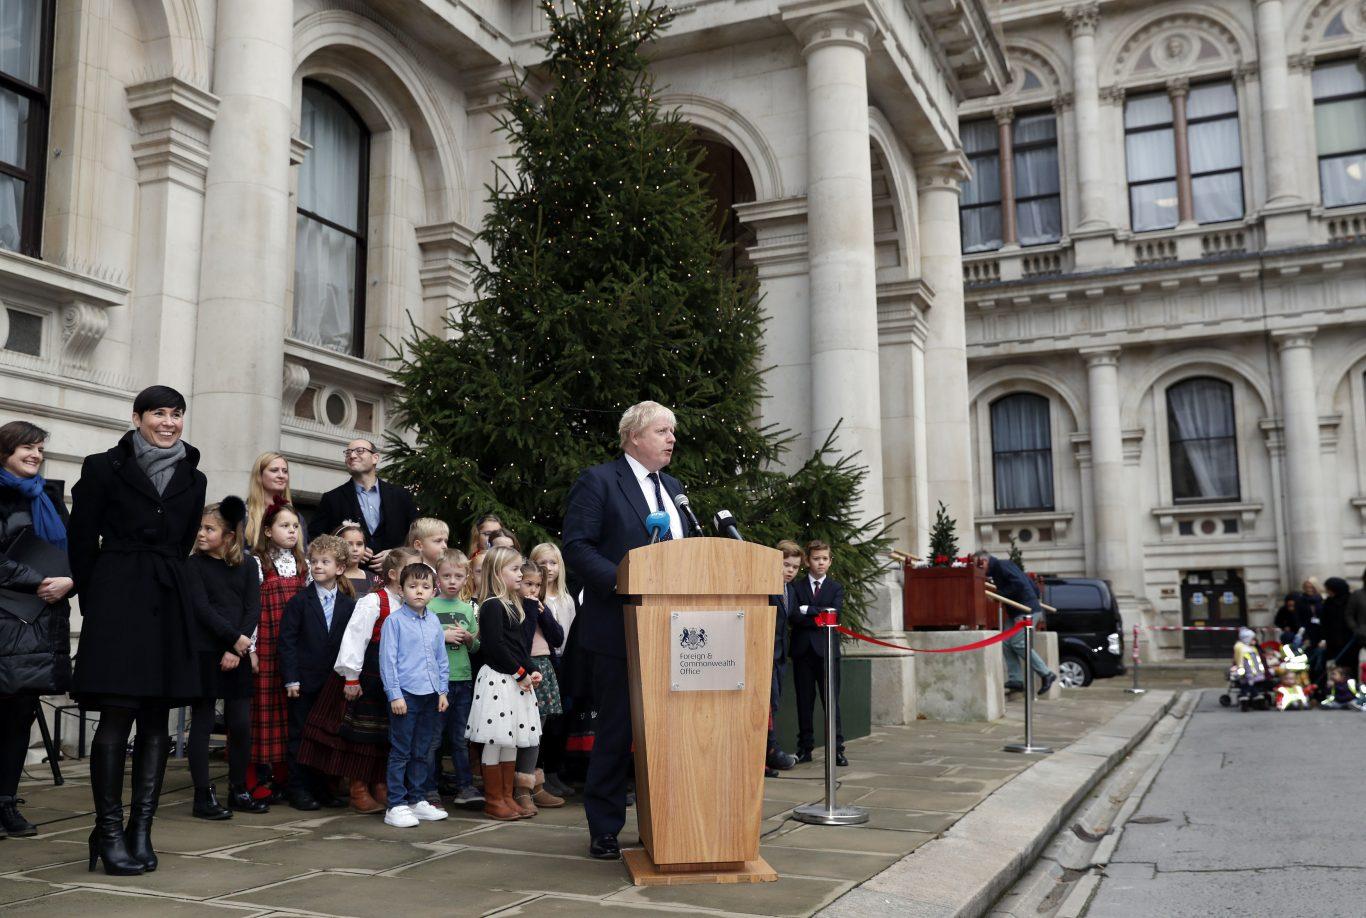 Boris Johnson speaks during the unveiling of the Christmas tree (Adrian Dennis/PA)